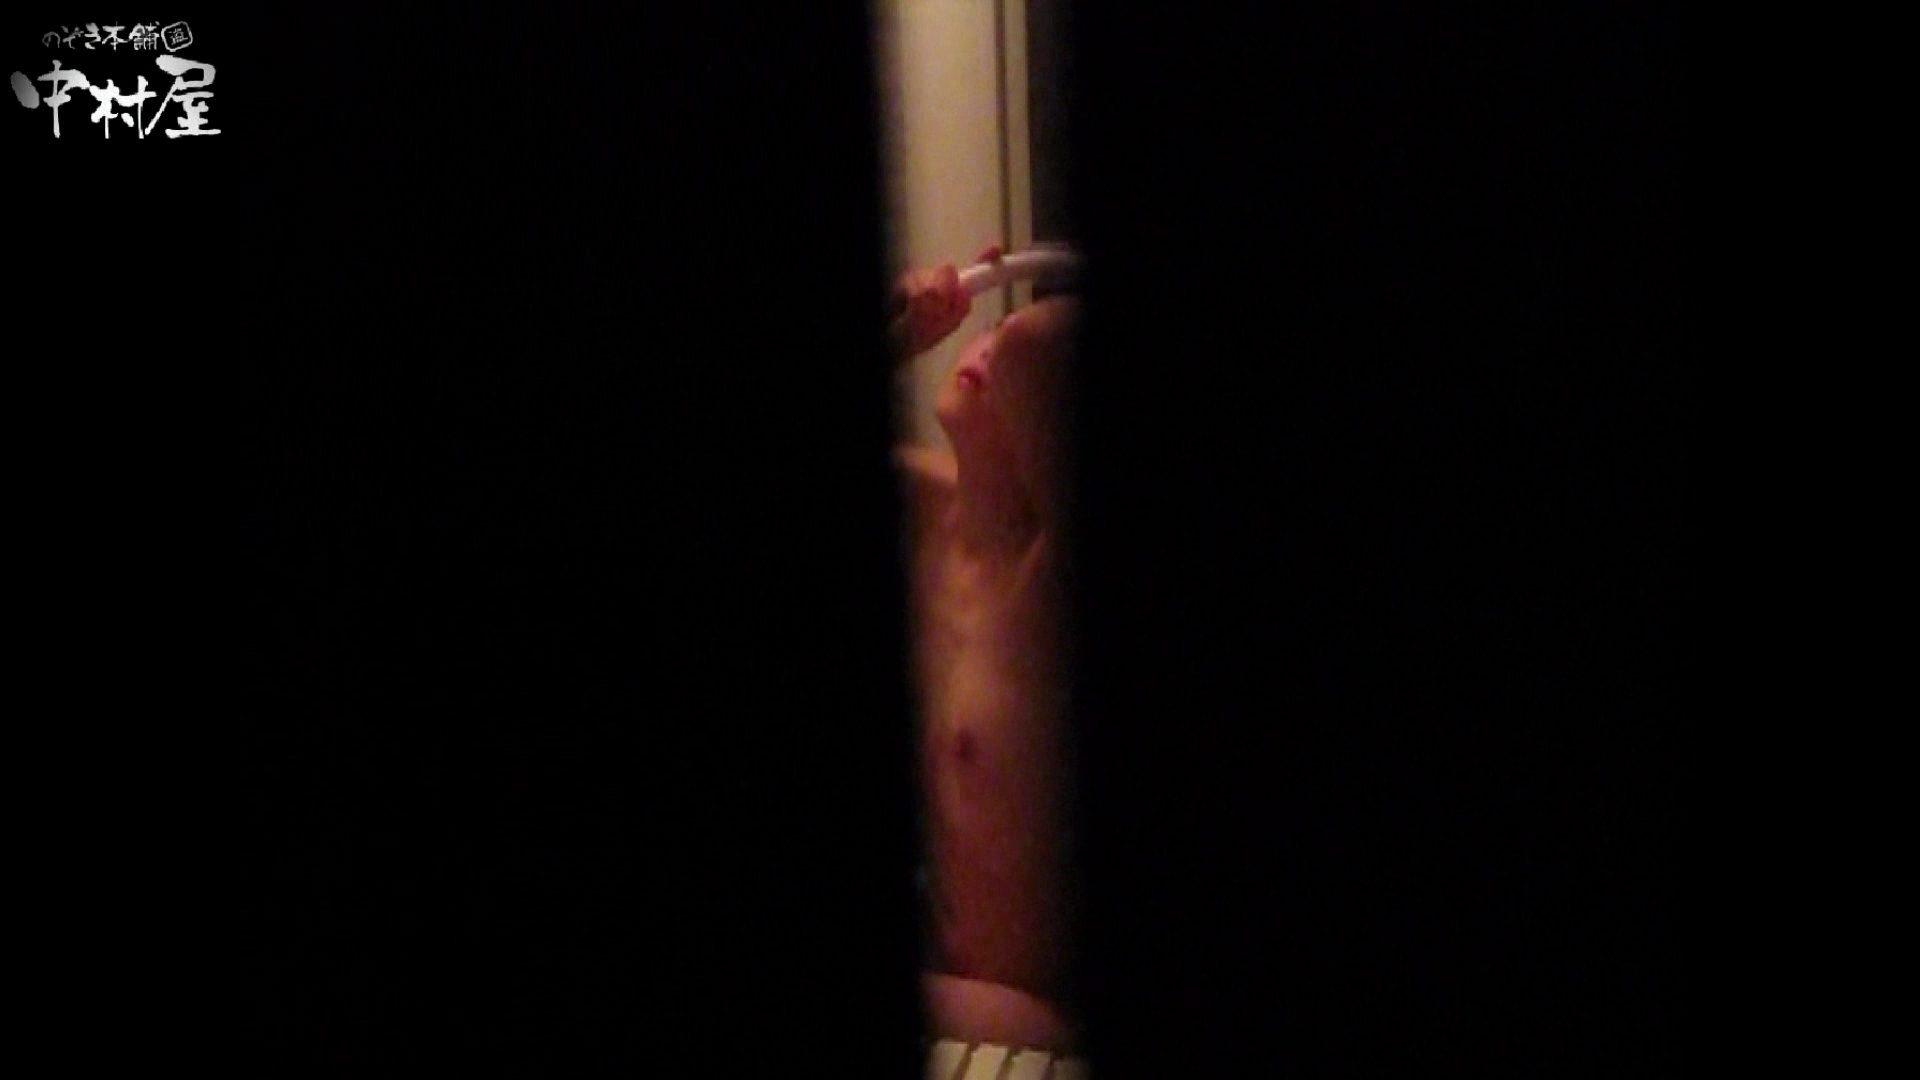 民家風呂専門盗撮師の超危険映像 vol.004 エロい美少女  89PIX 45